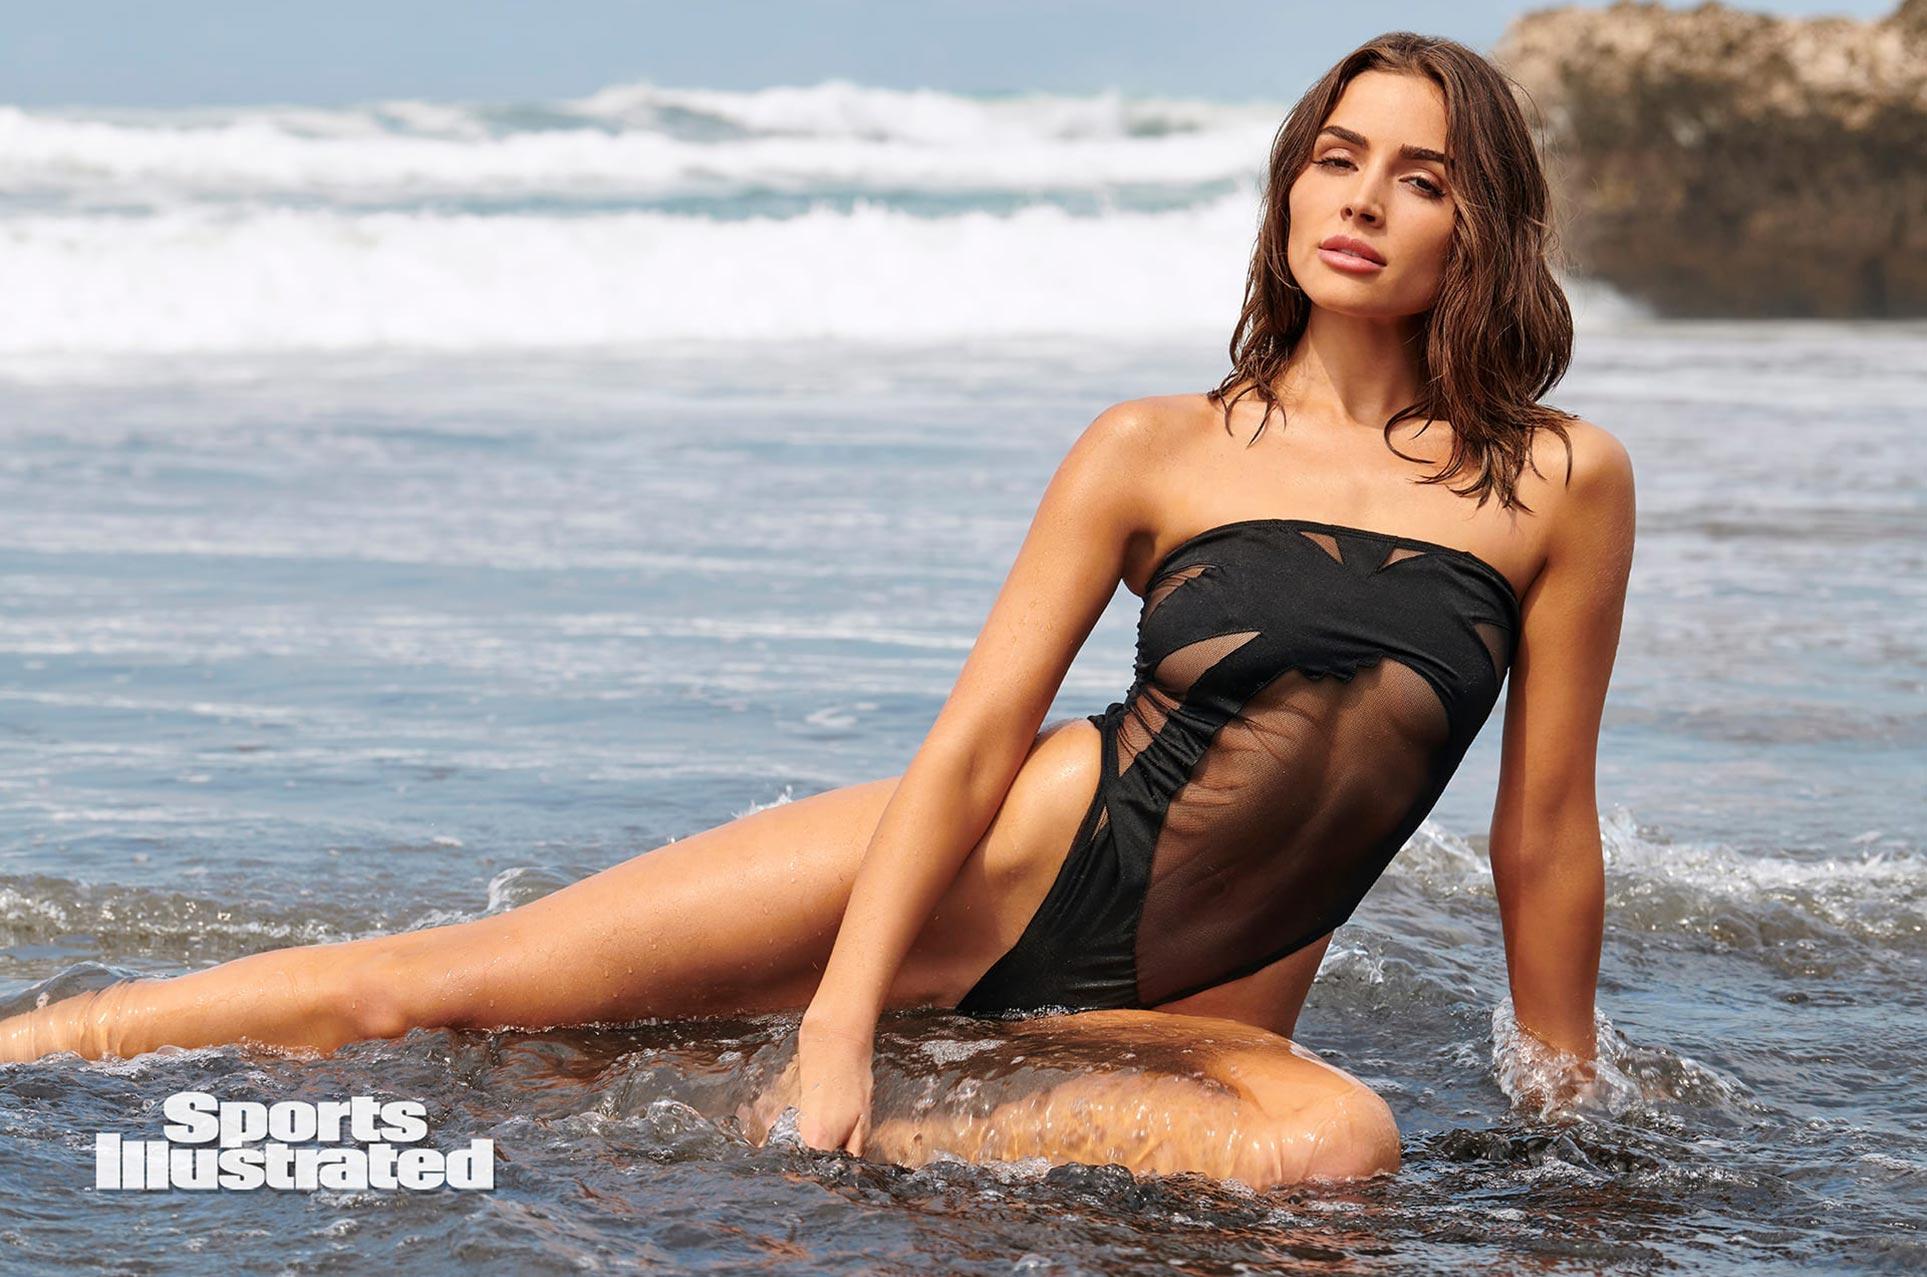 Оливия Калпо в каталоге купальников Sports Illustrated Swimsuit 2020 / фото 04